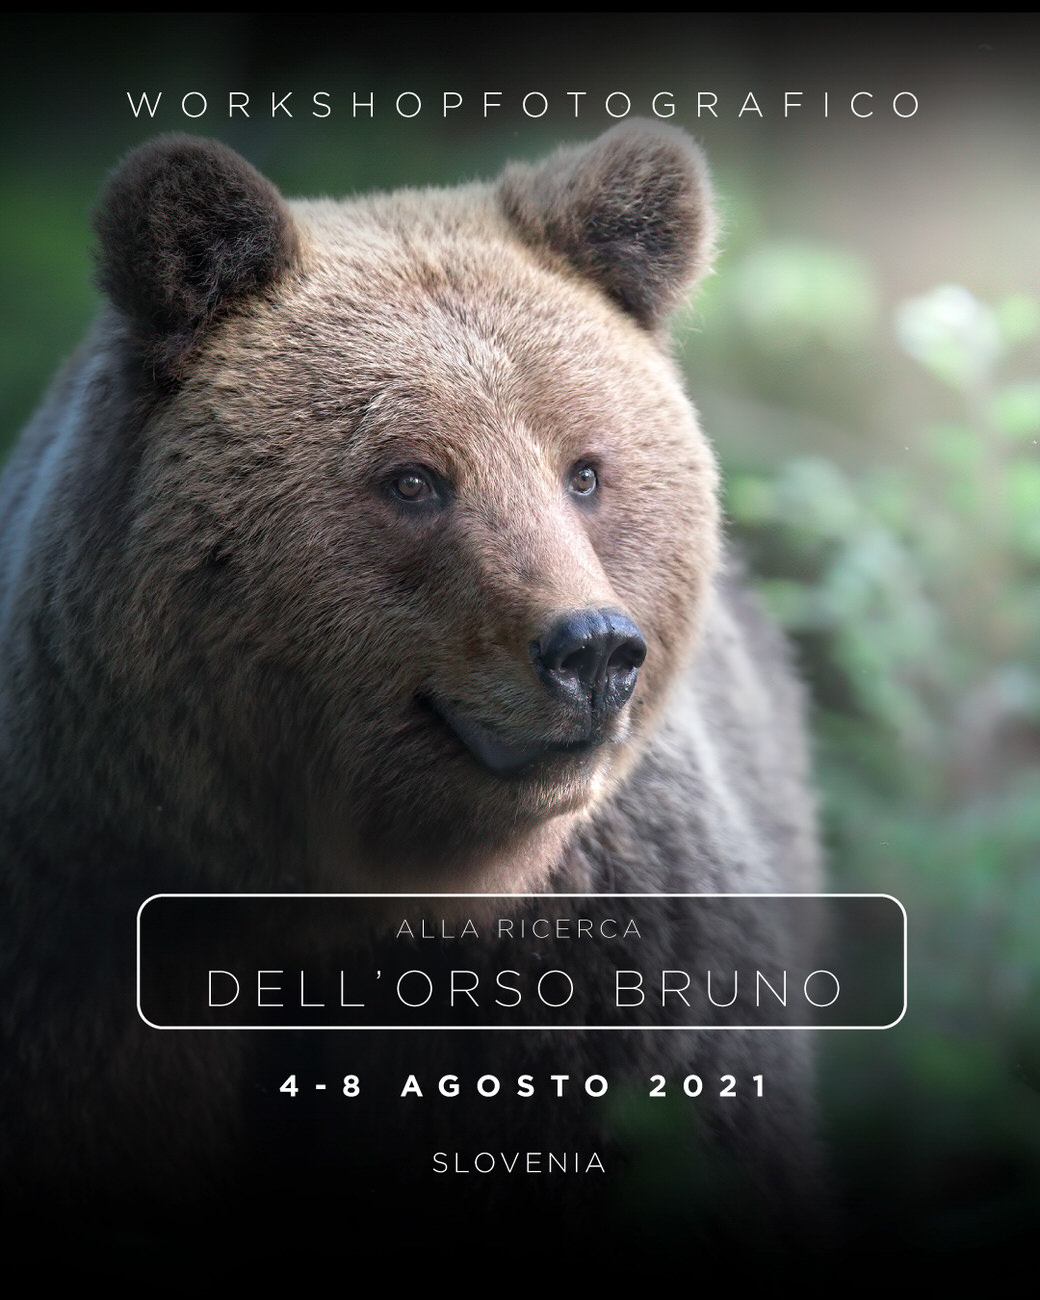 workshop fotografia naturalistica orso bruno michele bavassano